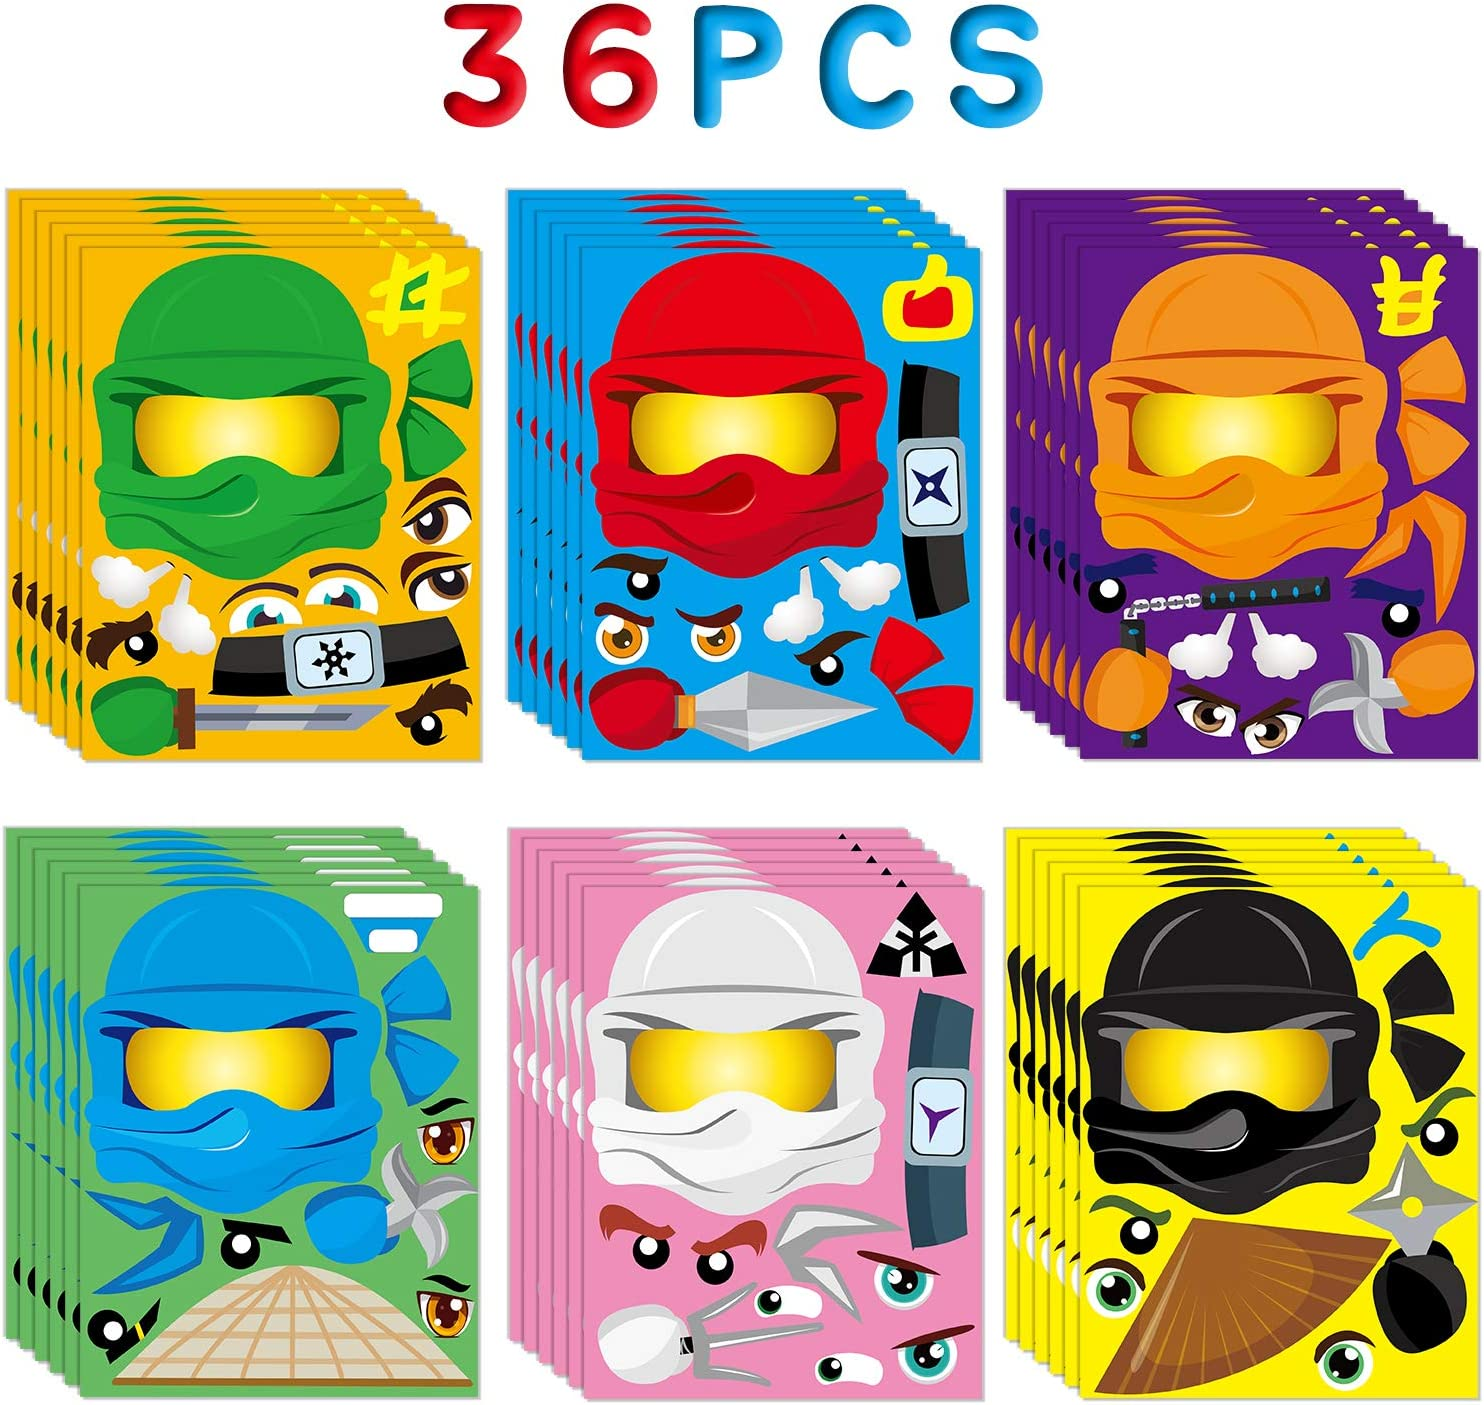 MALLMALL636Pcs Ninja MakeaFaceStickers DIY Art Crafts Kit PartyFavorsGames Ninja Themed Birthday Party Supplies Dress Up Ninja Masters Sticker Decorations Classroom Prizes for Kids Boys Girls